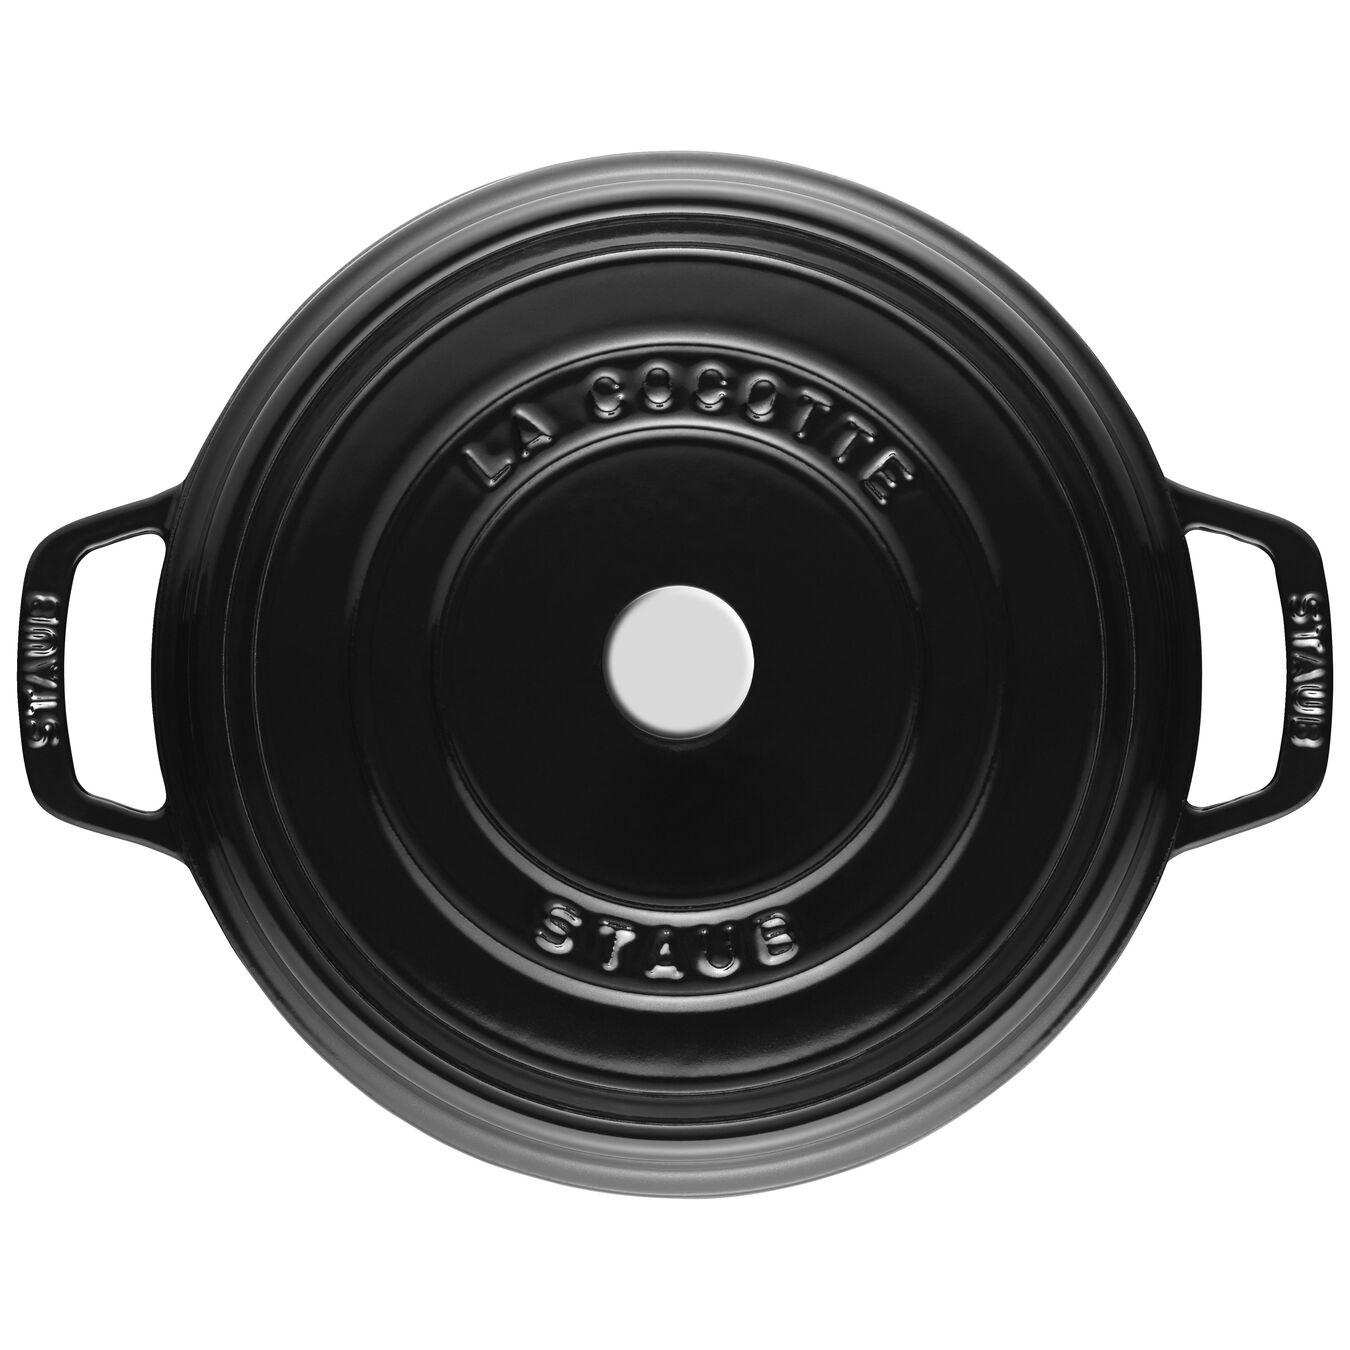 3.75 l Cast iron round Cocotte, Shiny-Black,,large 4